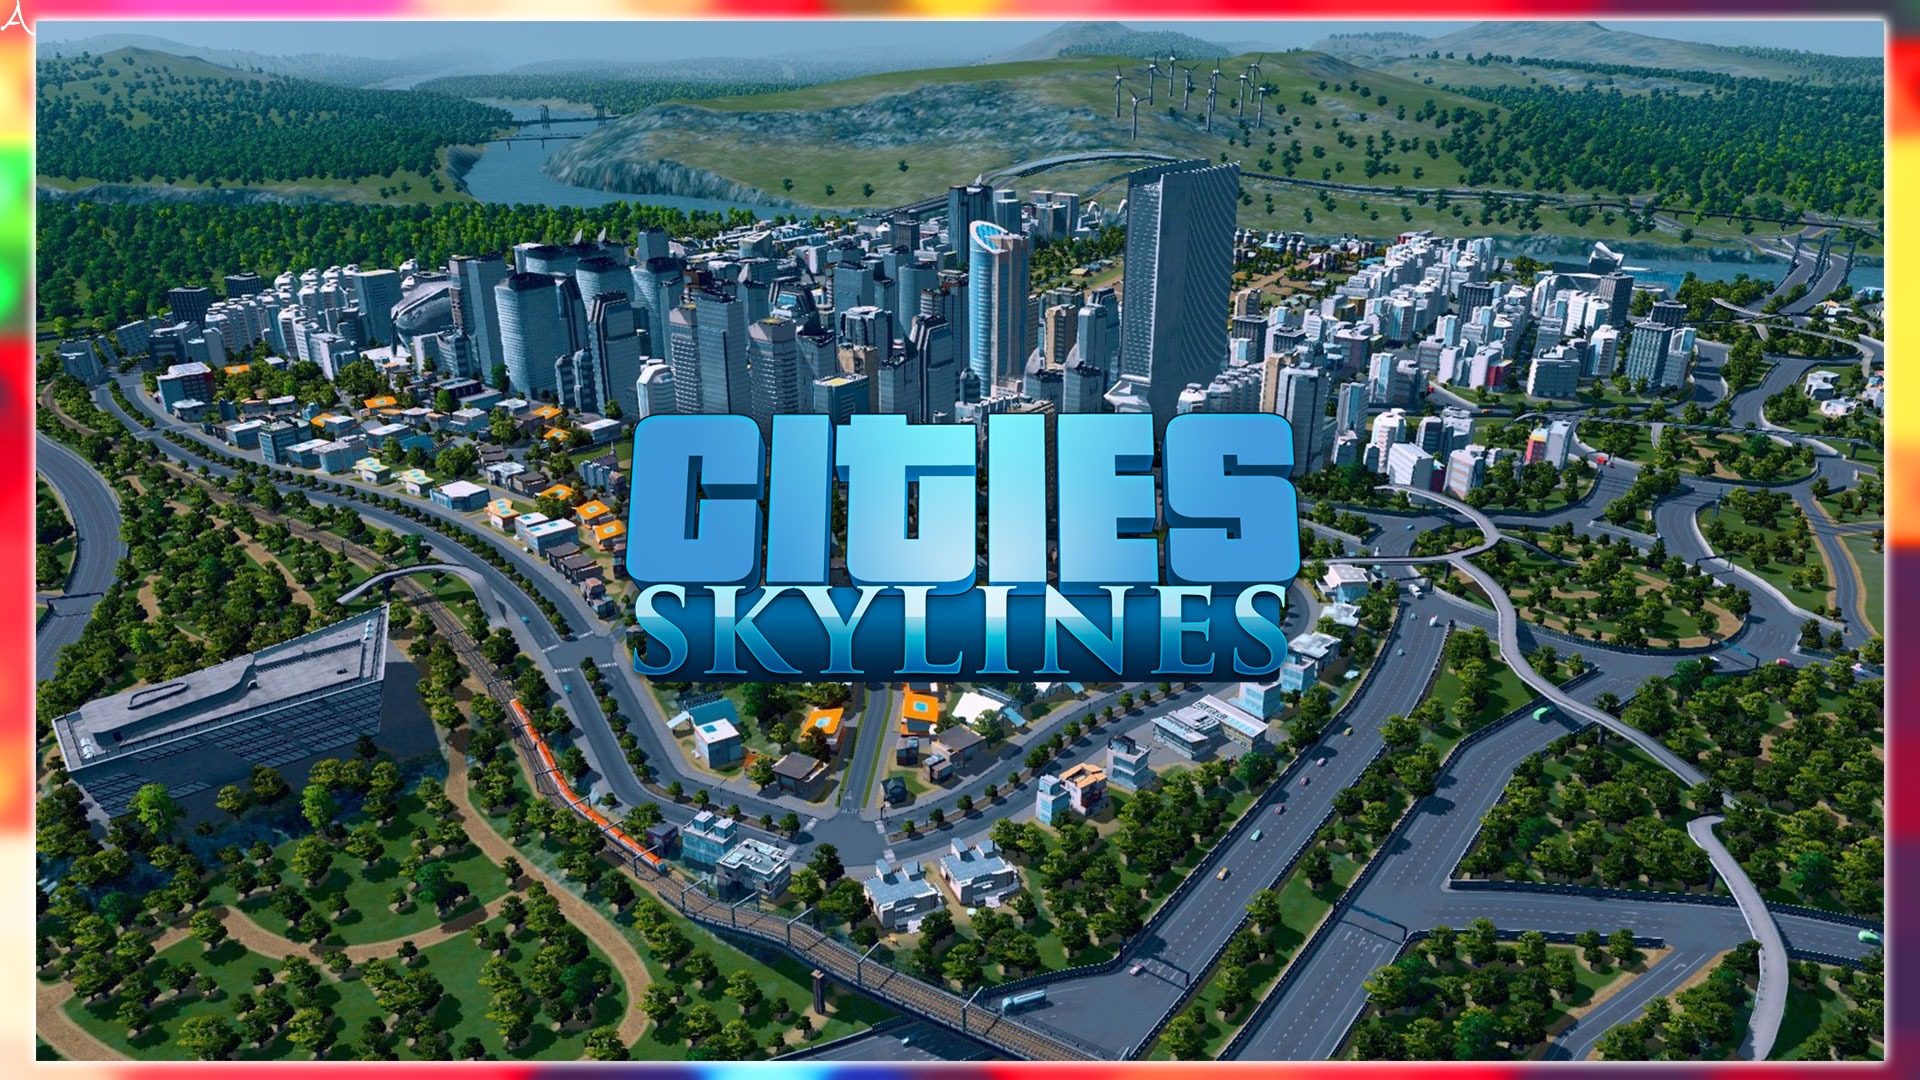 PC版「Cities Skylines」に必要な最低/推奨スペックを確認:快適プレイに必要な値段はどれくらい?